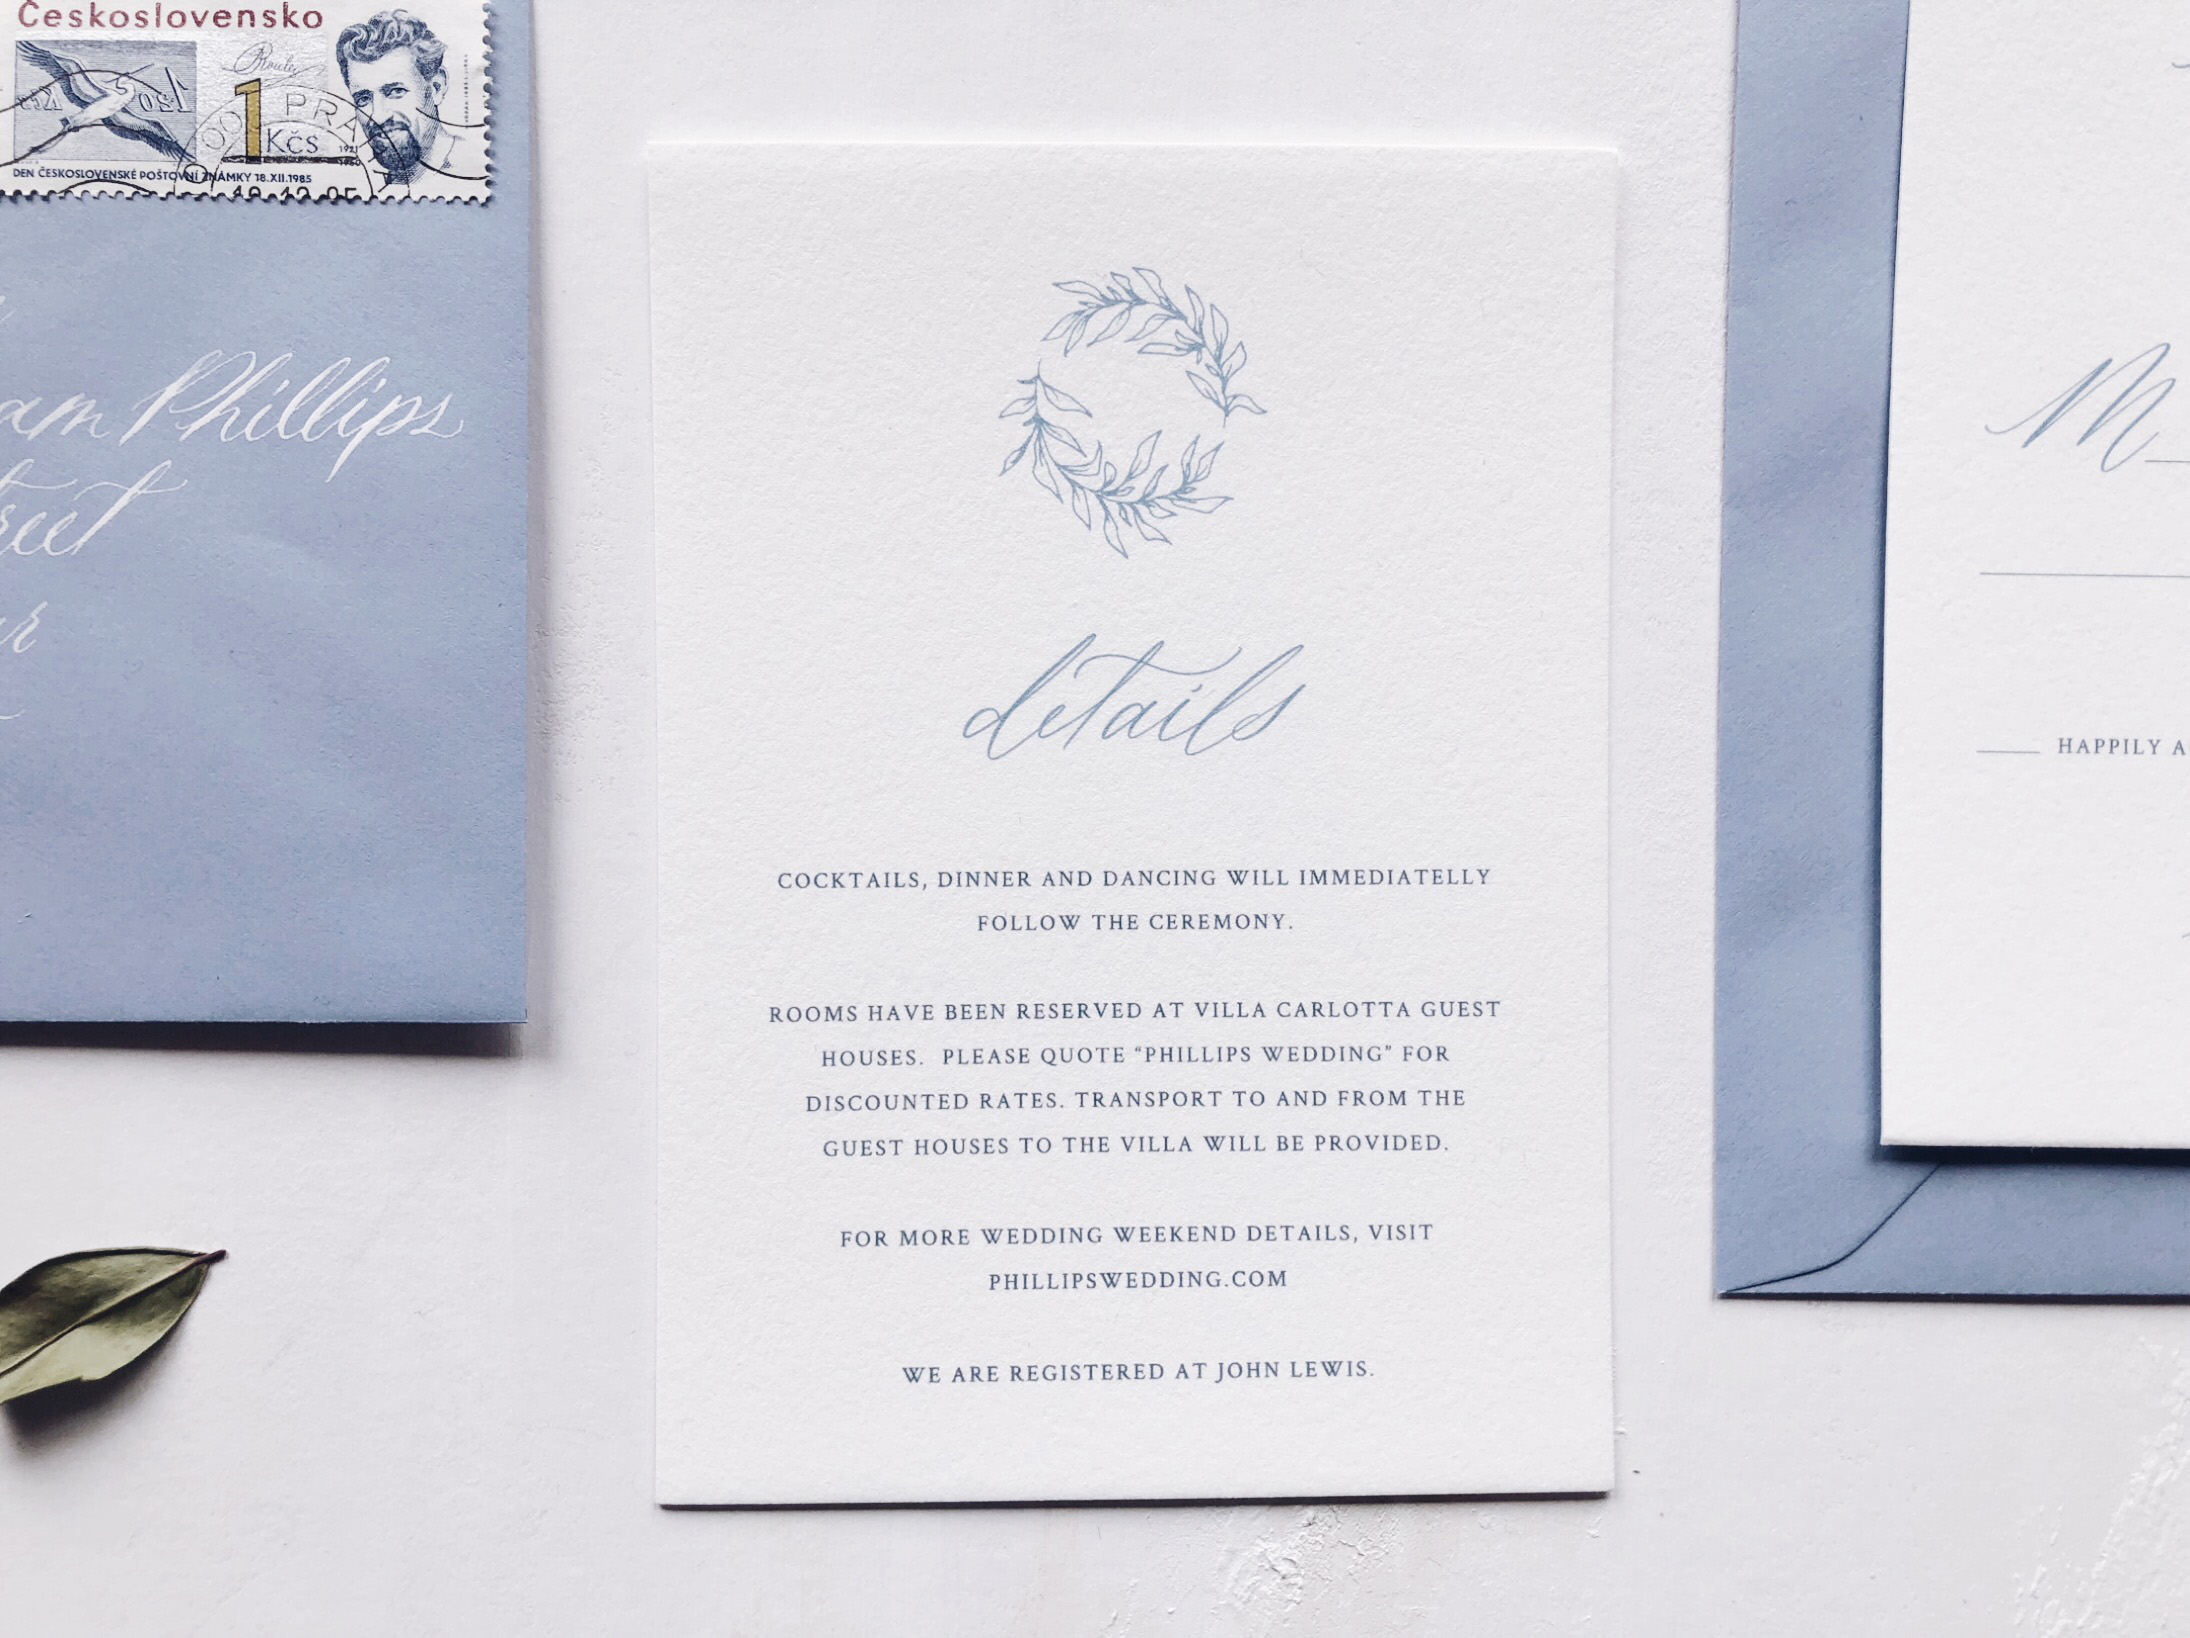 delicate_wedding_invitations_illustration.JPG